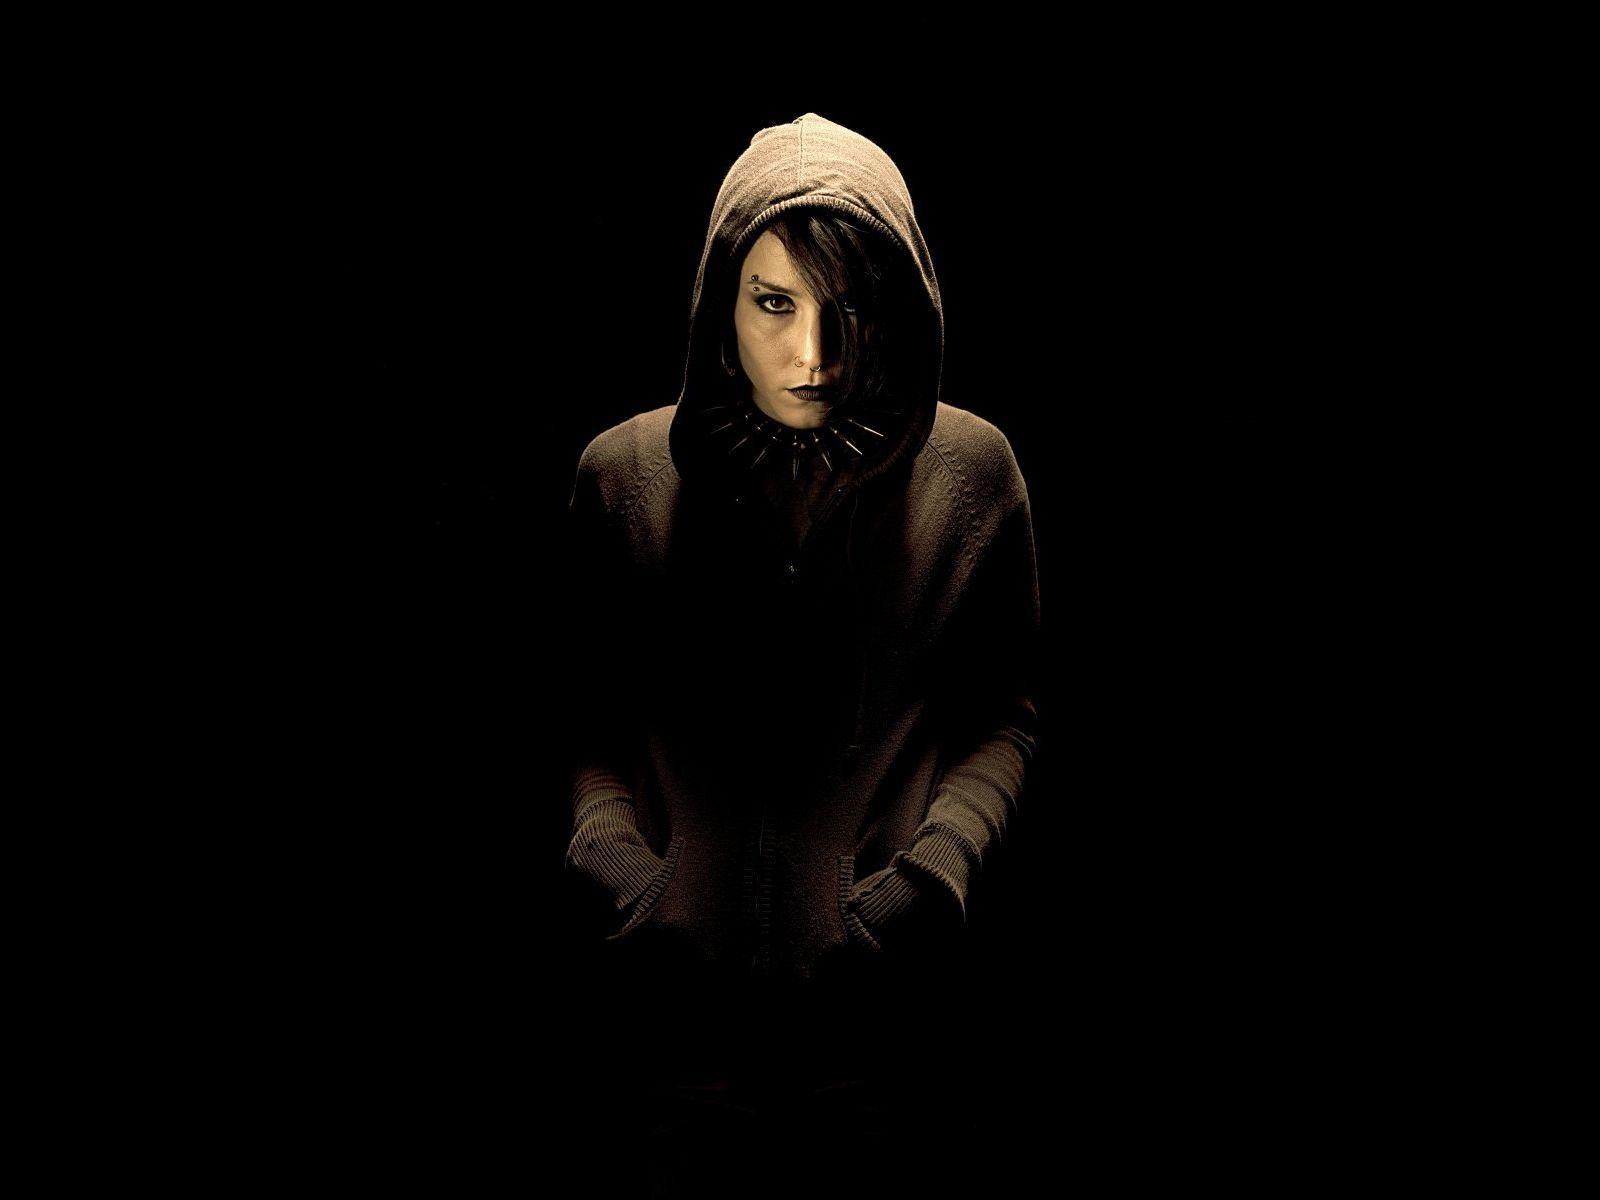 http://1.bp.blogspot.com/_8GJbAAr1DY8/TPBl7IaYOrI/AAAAAAAACGs/sizZd9BalnM/s1600/Noomi_Rapace_01.jpg